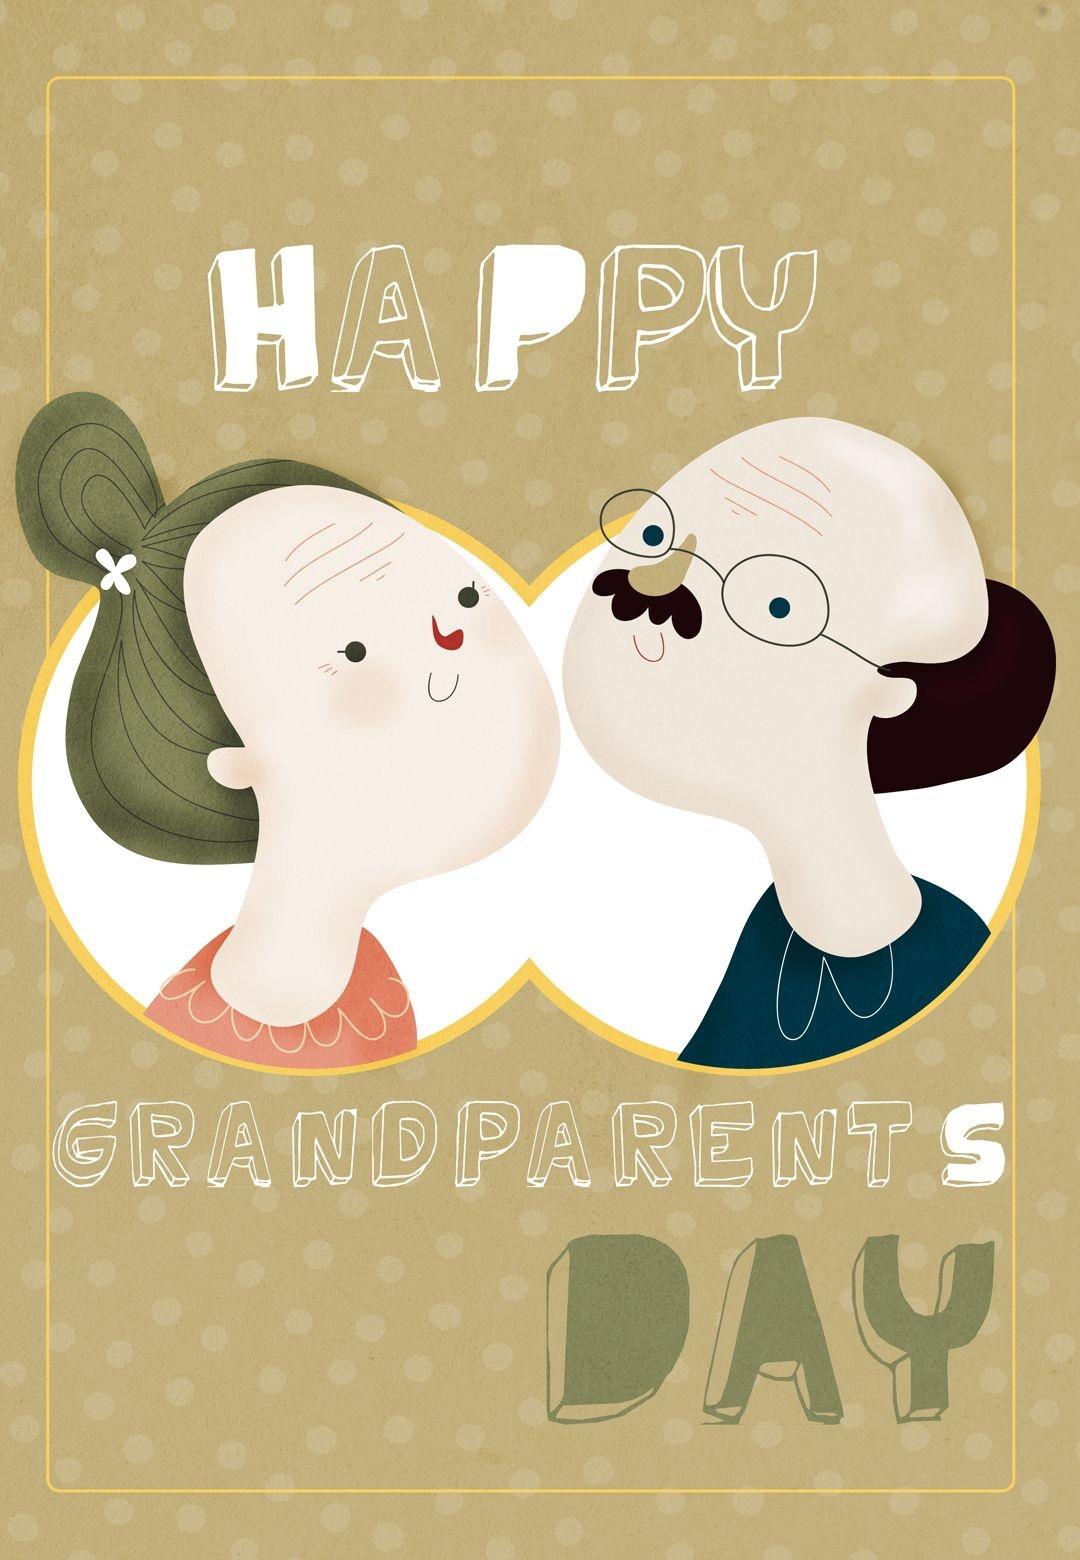 Free Printable Happy Grandparents Day Greeting Card   Grandparents - Grandparents Day Cards Printable Free